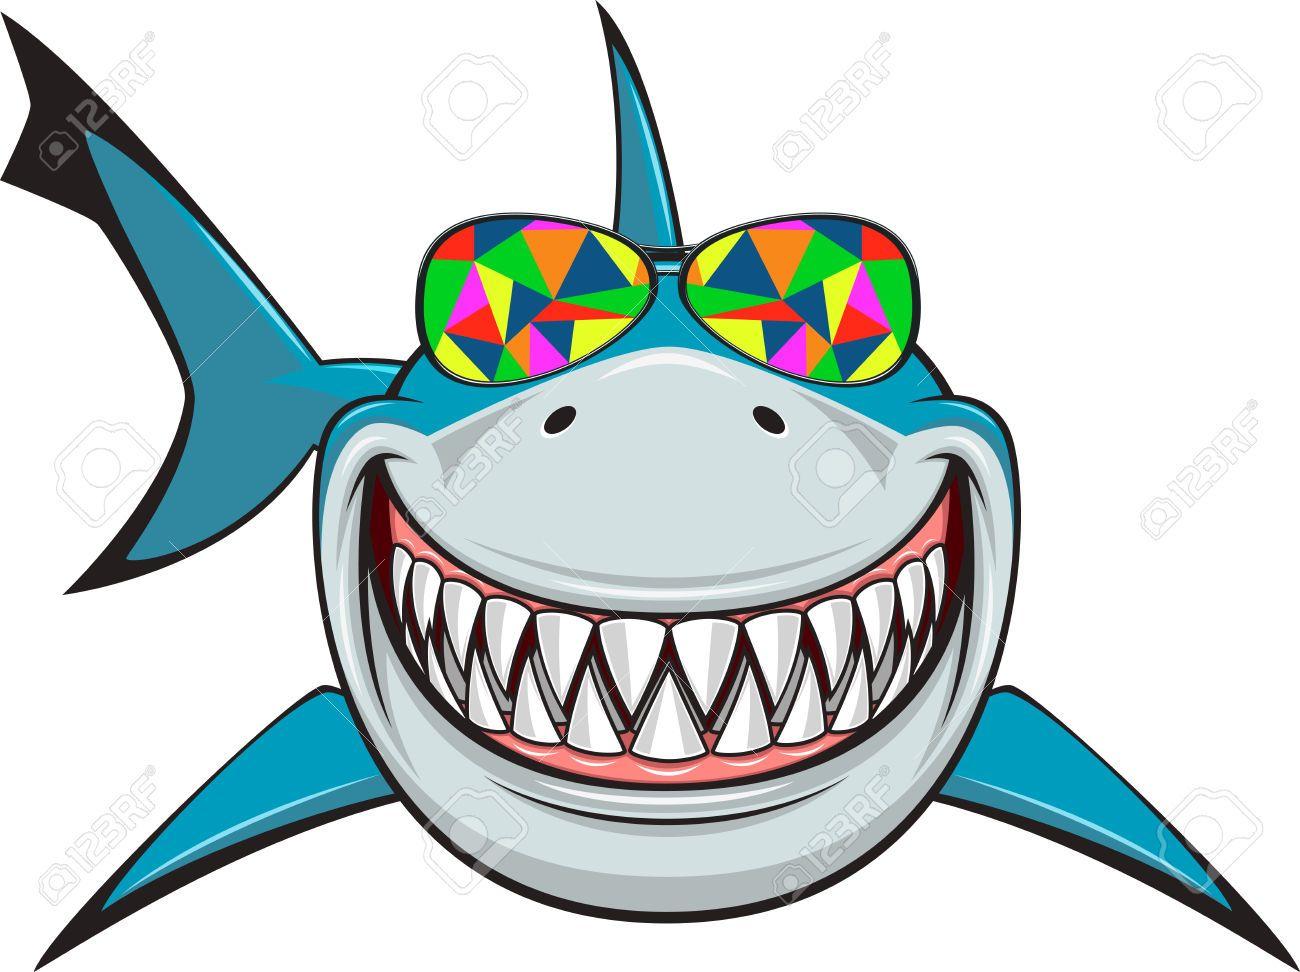 Resultado de imagen de funny shark face clipart.